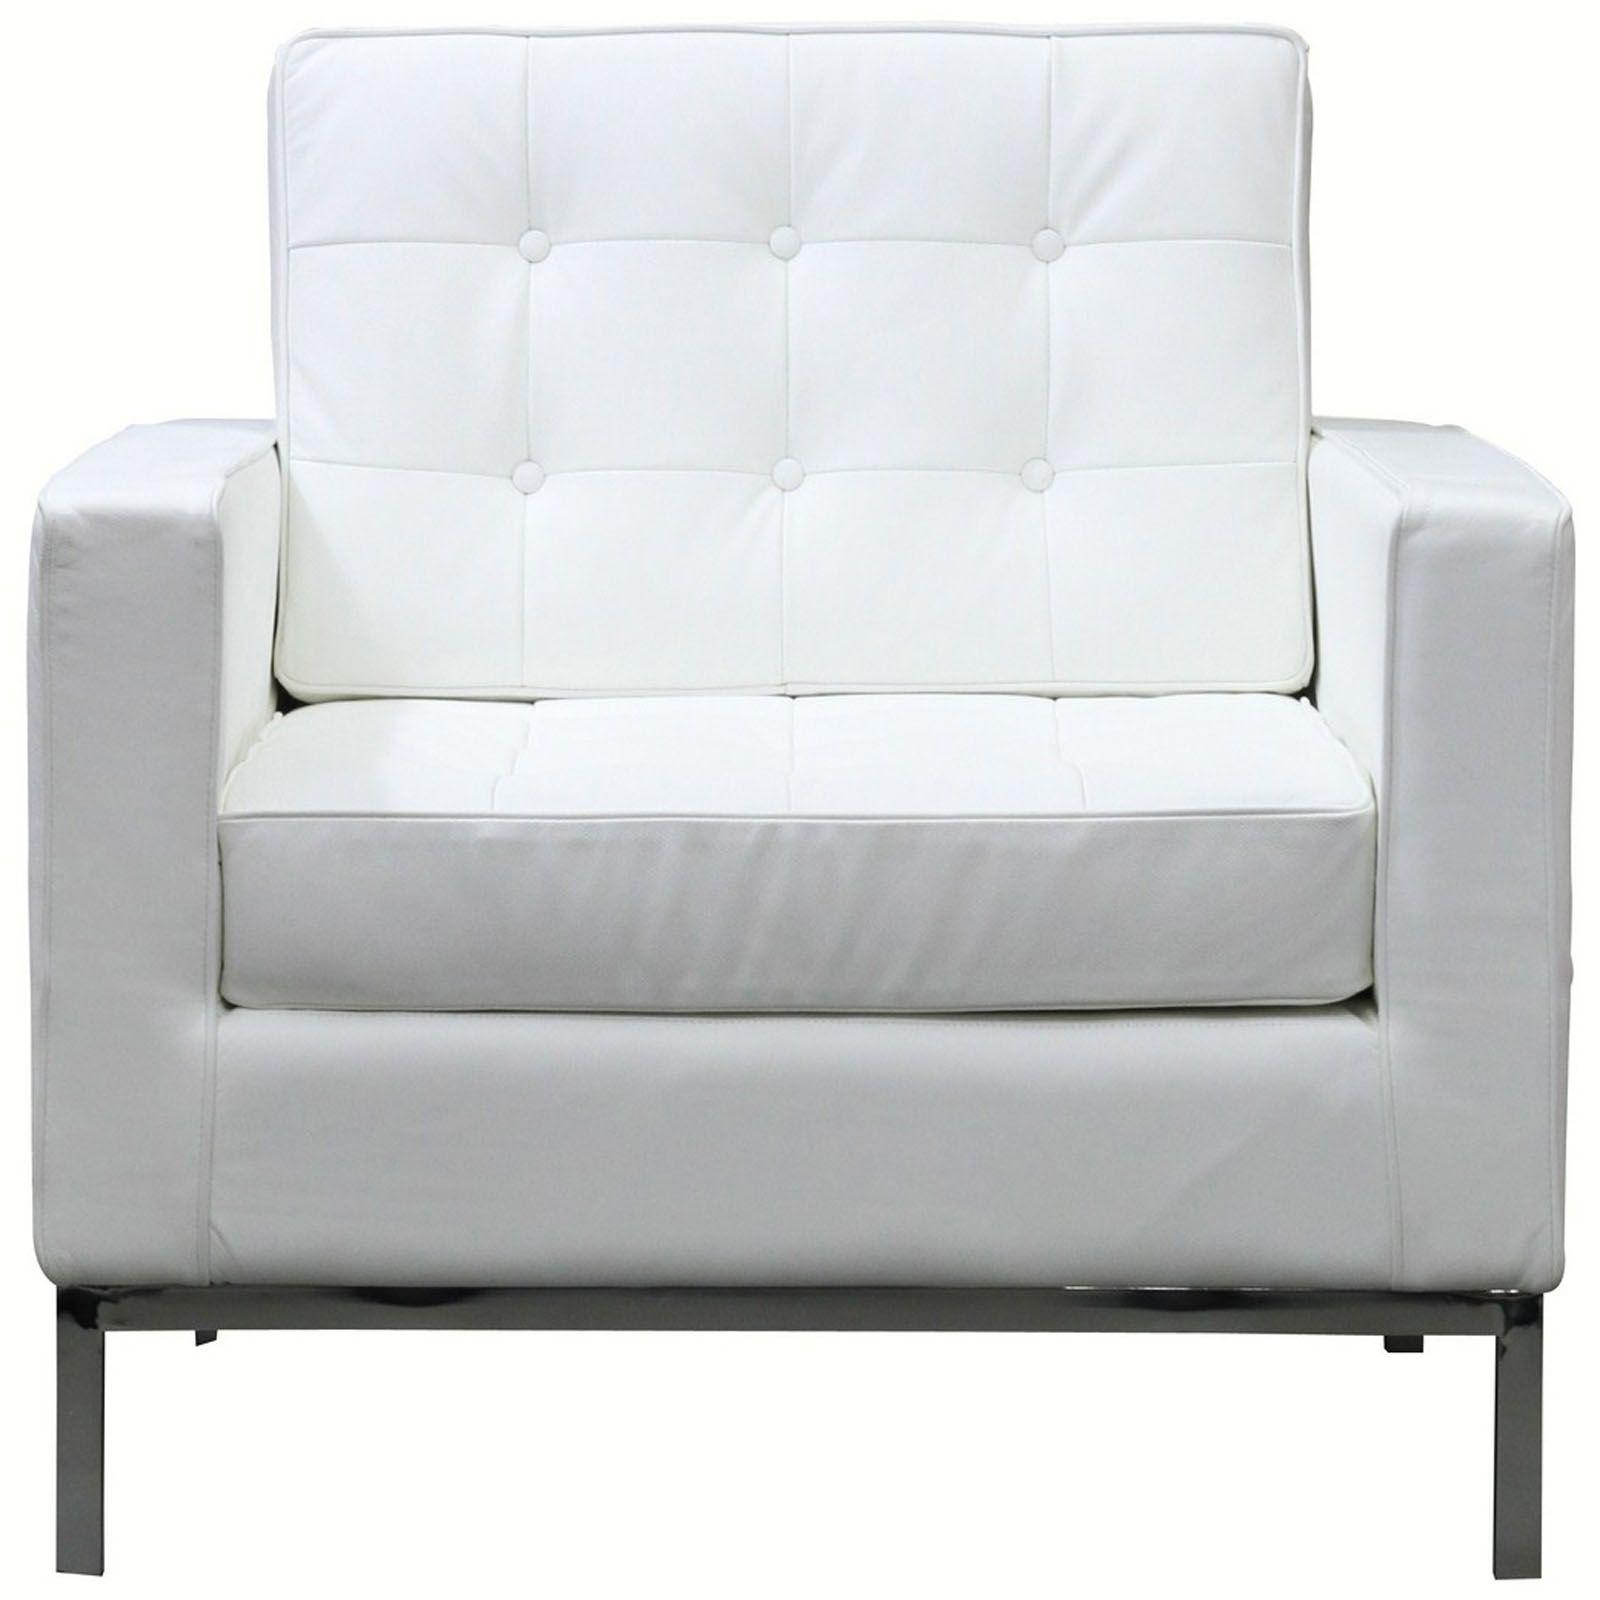 Modern White Leather Club Chair Hanging Notonthehighstreet Bateman Armchair Living Room Decor Pinterest